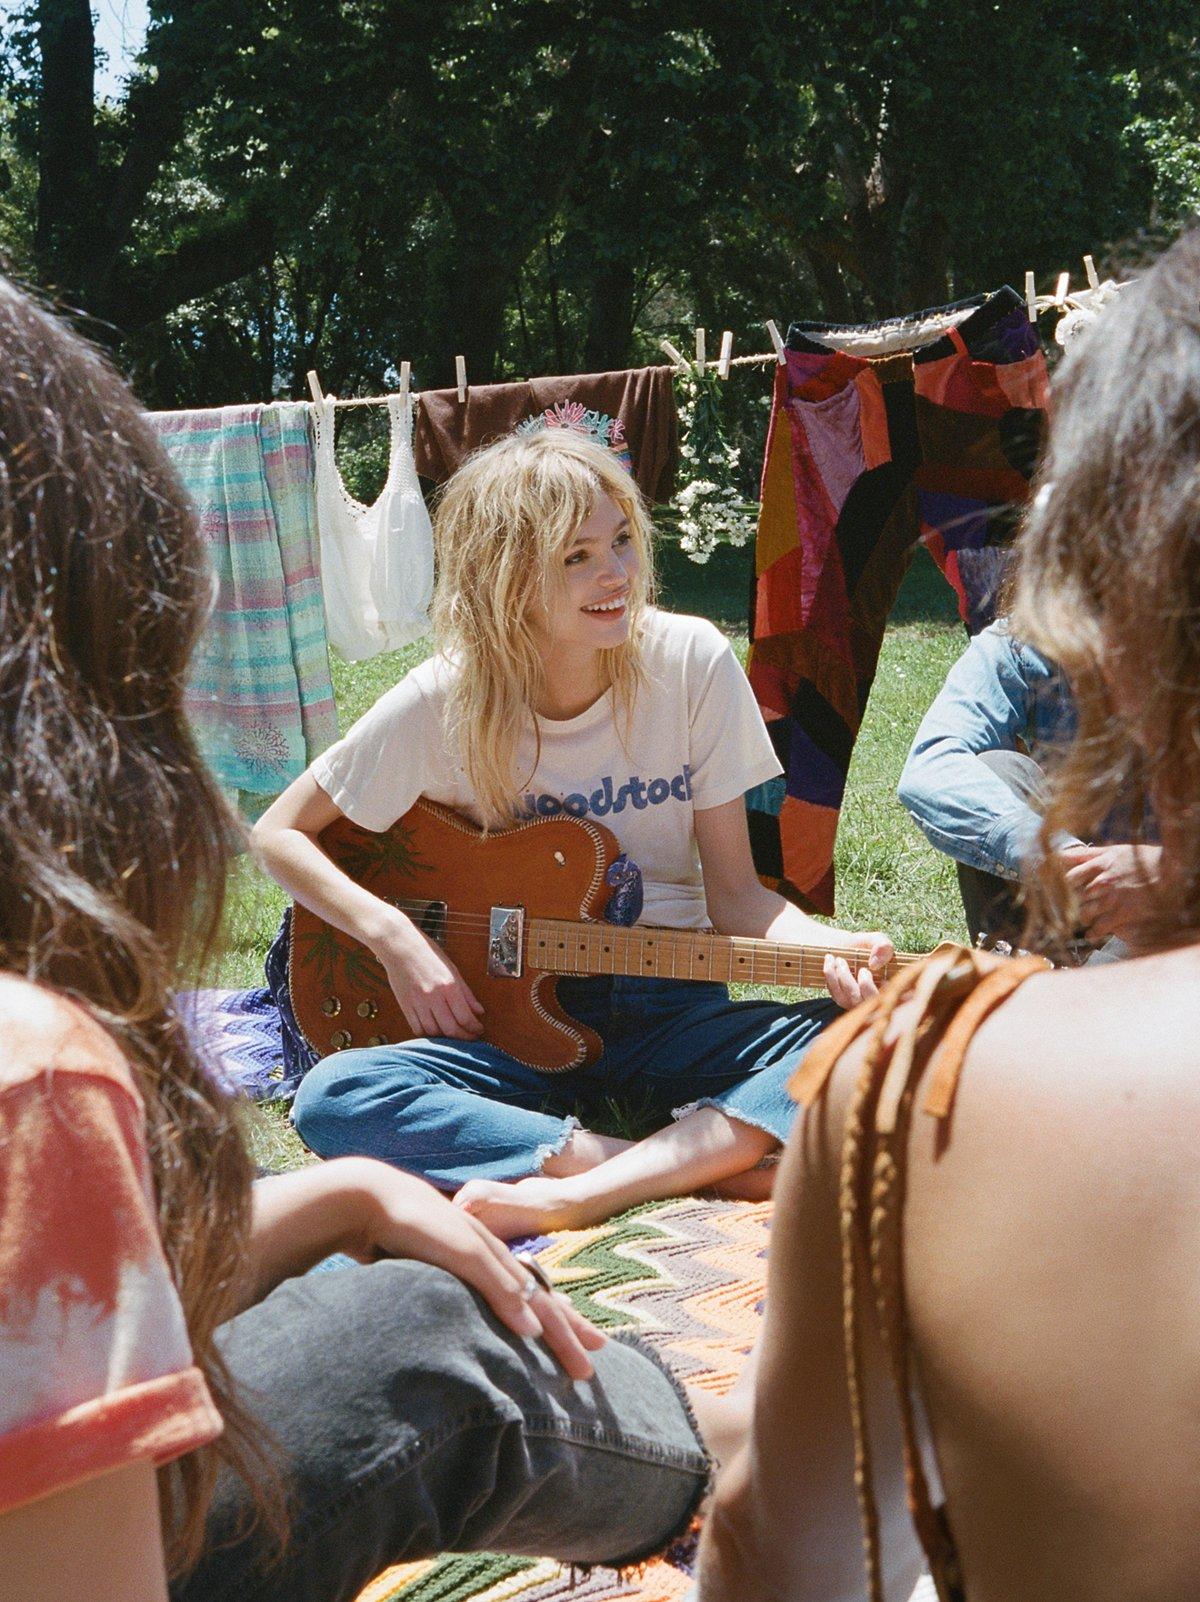 Woodstock T恤